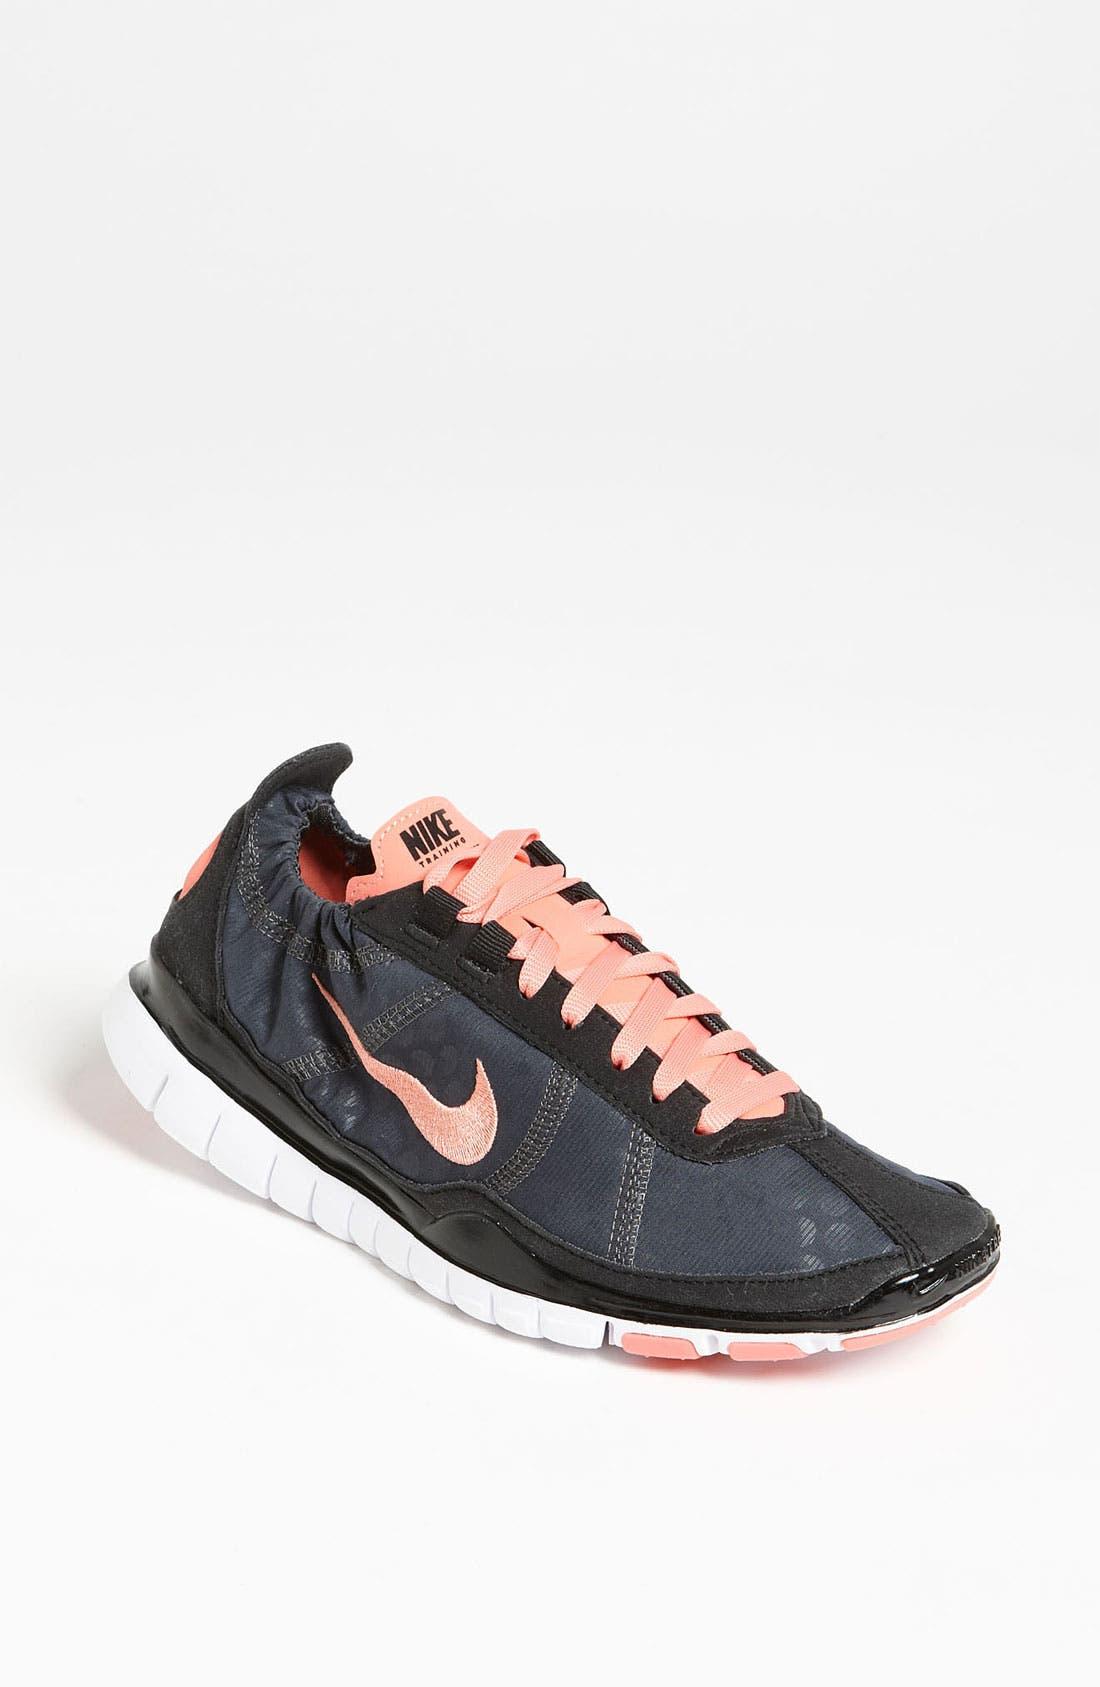 Alternate Image 1 Selected - Nike 'Free Twist' Training Shoe (Women)